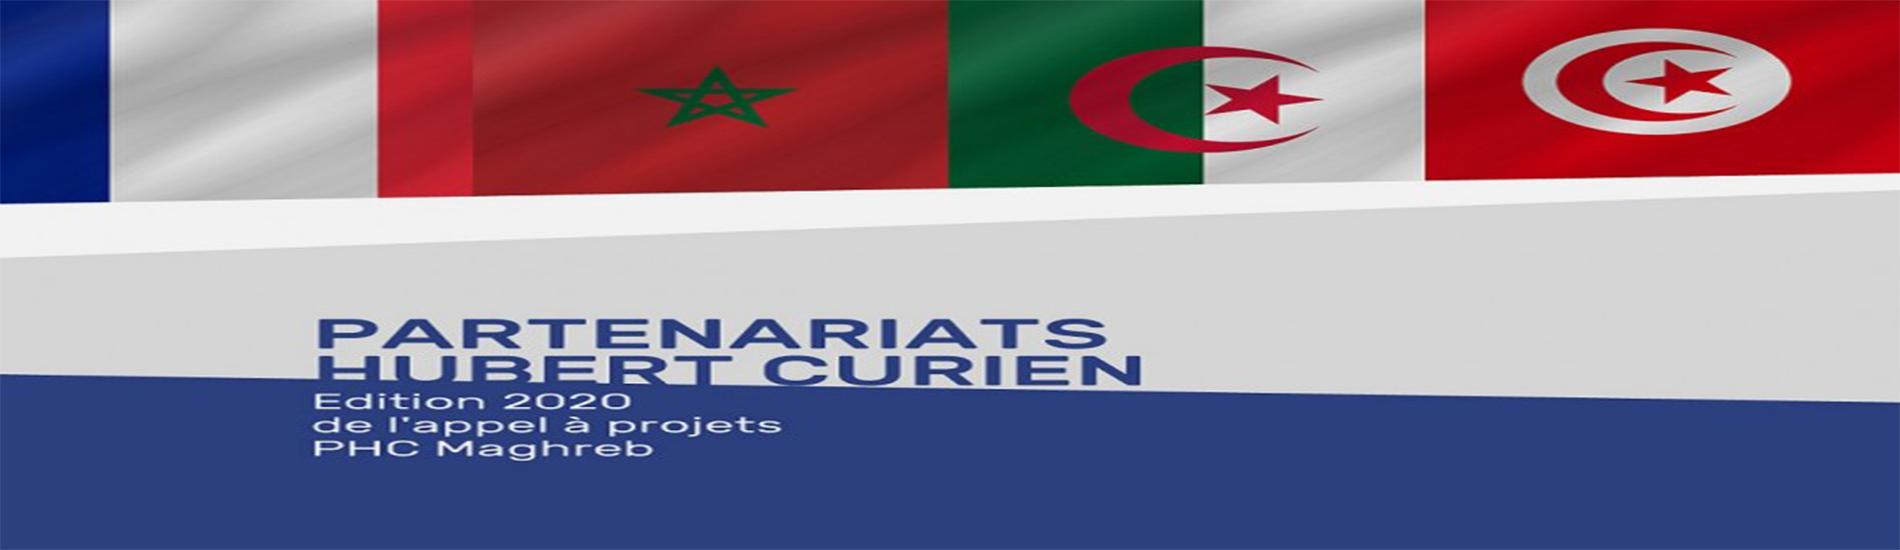 Programme TASSILI 2020 Programme PHC-Maghreb 2020